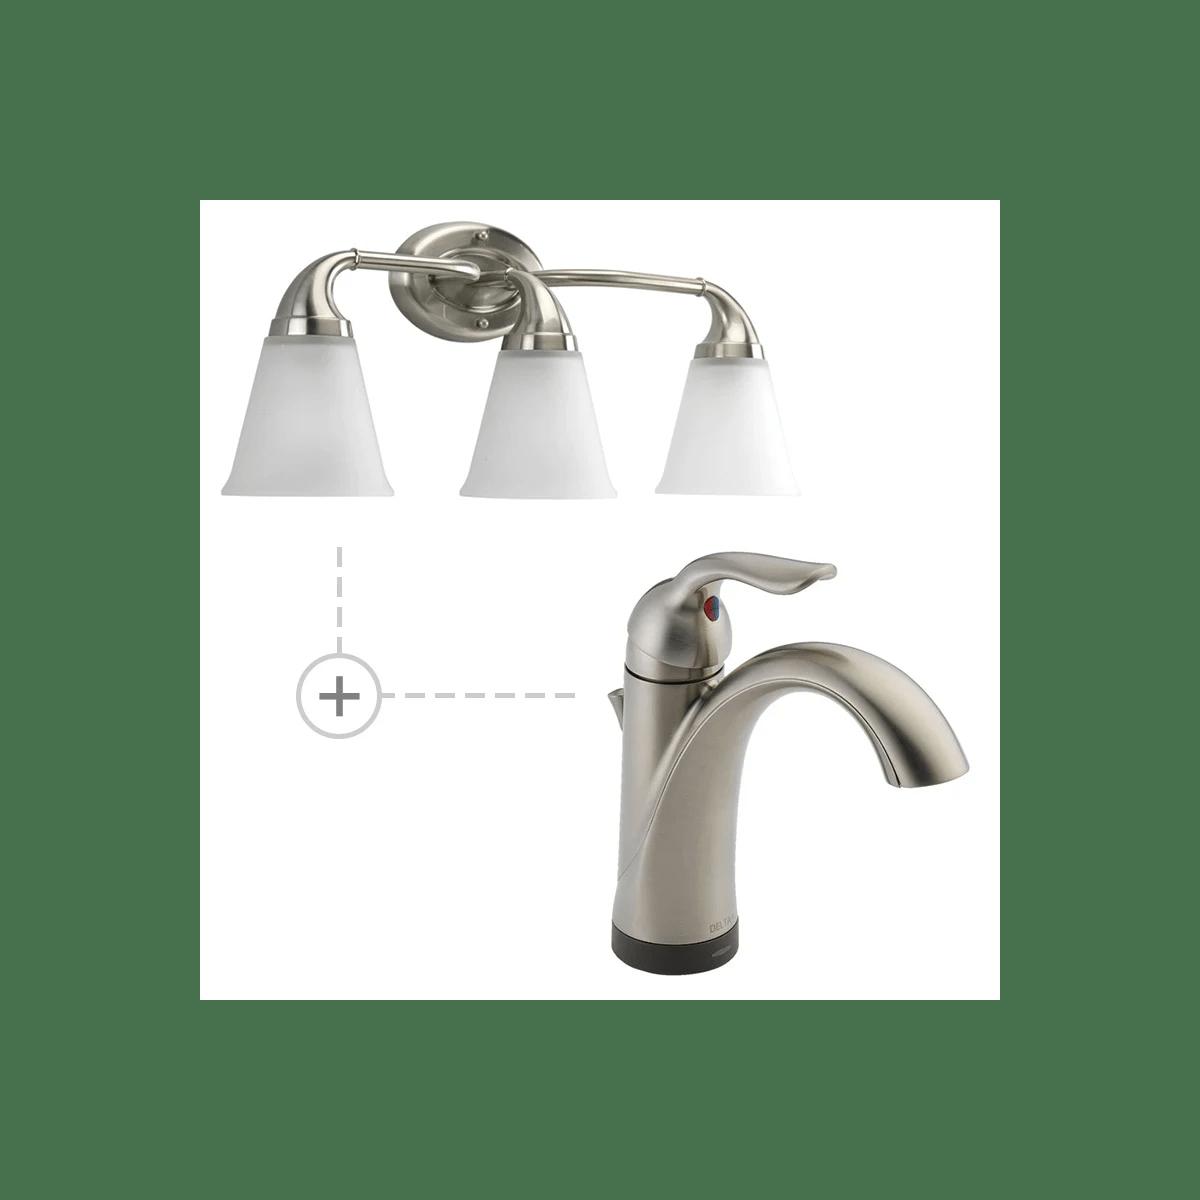 lahara single hole bathroom faucet